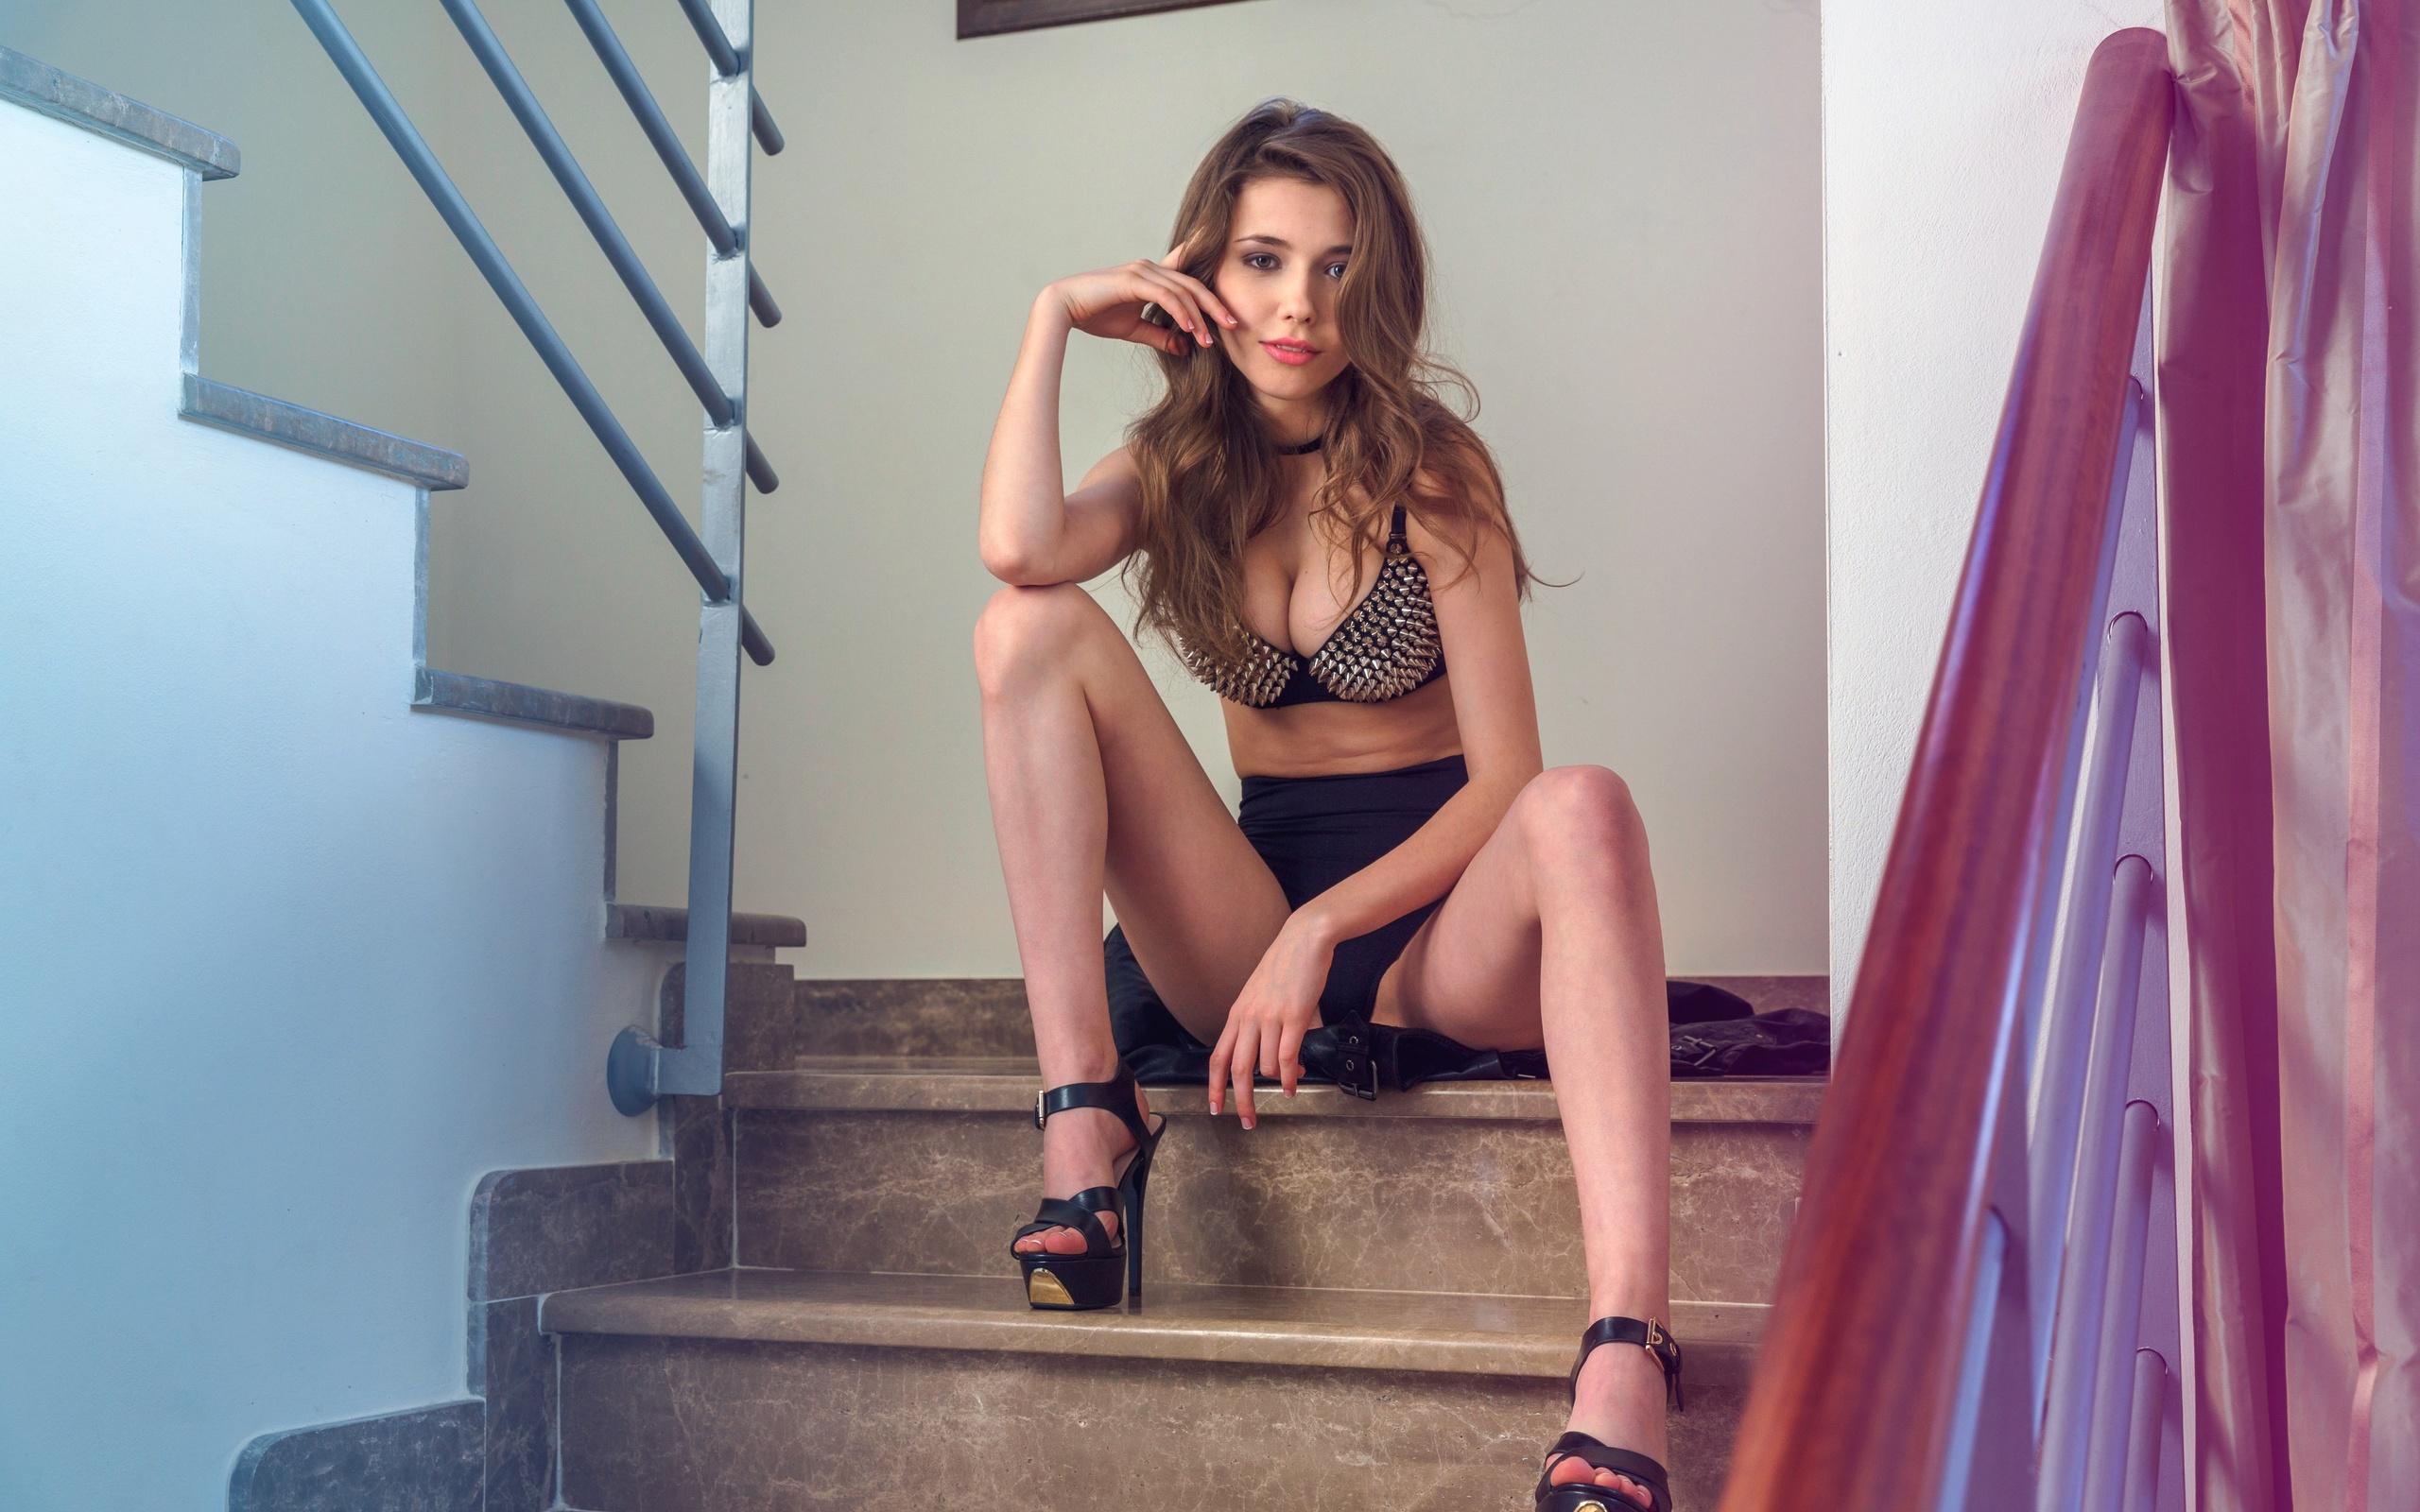 Трахает на лестнице, трахнул на лестнице порно видео и фото на ПростоПорно 29 фотография